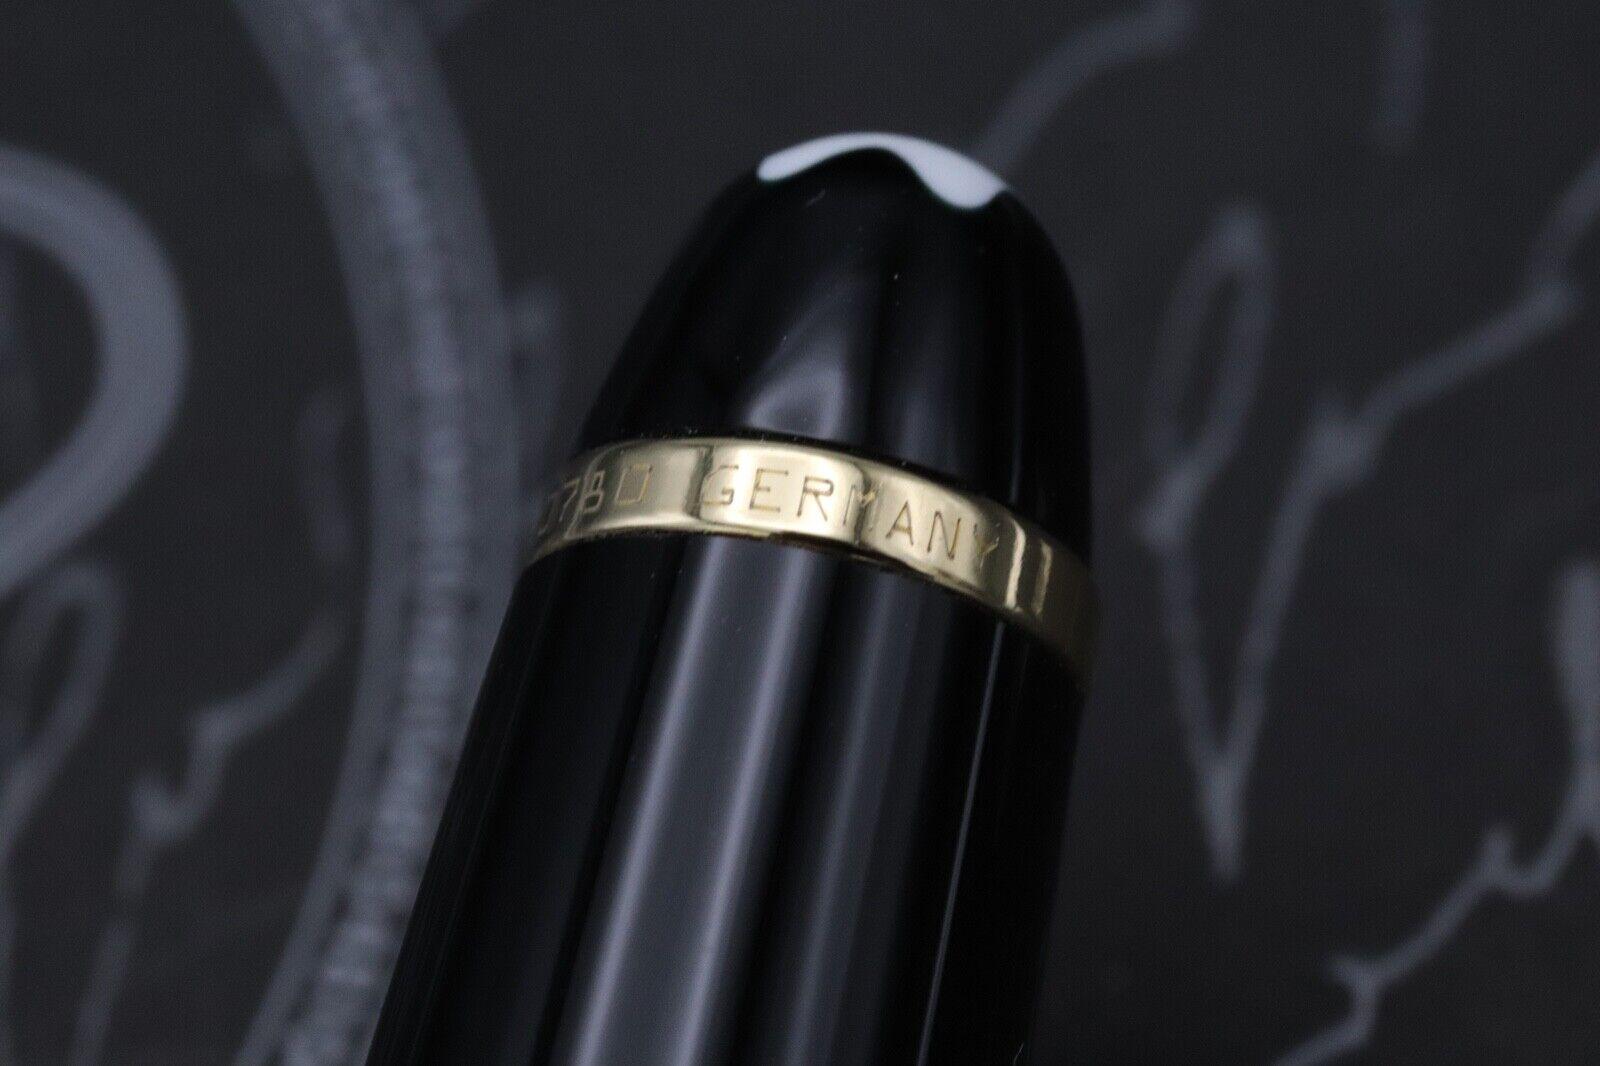 Montblanc Meisterstuck 144 Classique 'Wedding Pen' Fountain Pen 7